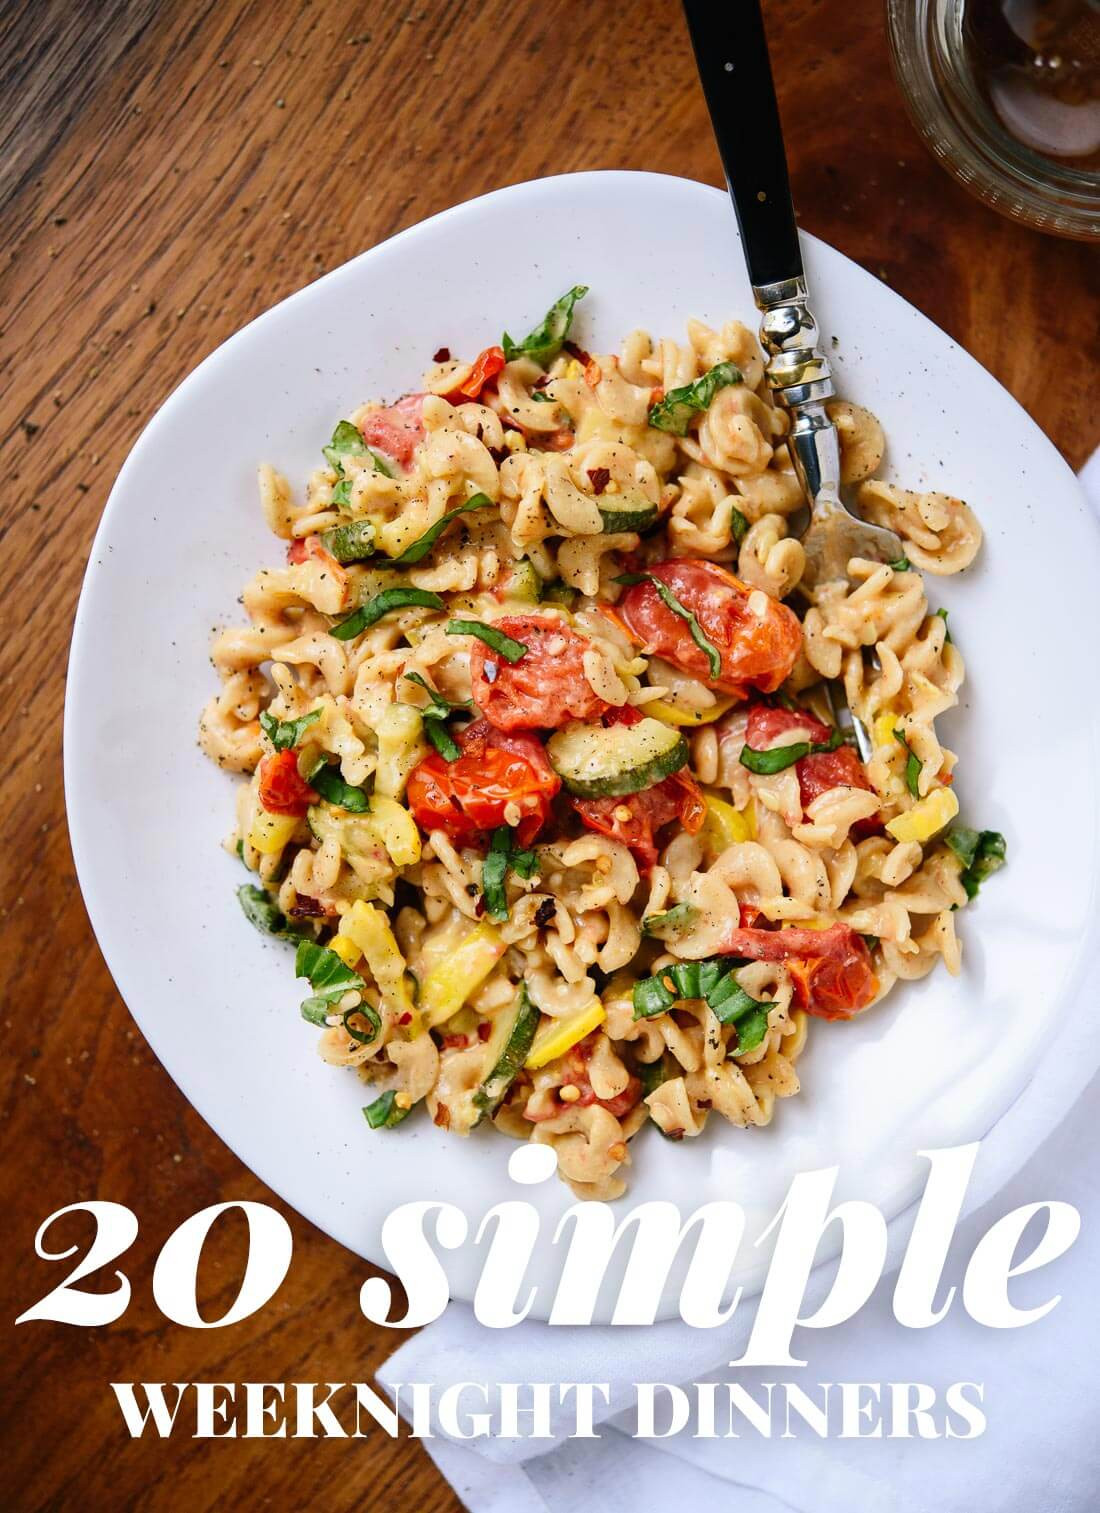 Veggie Dinner Ideas  20 Simple Ve arian Dinner Recipes Cookie and Kate